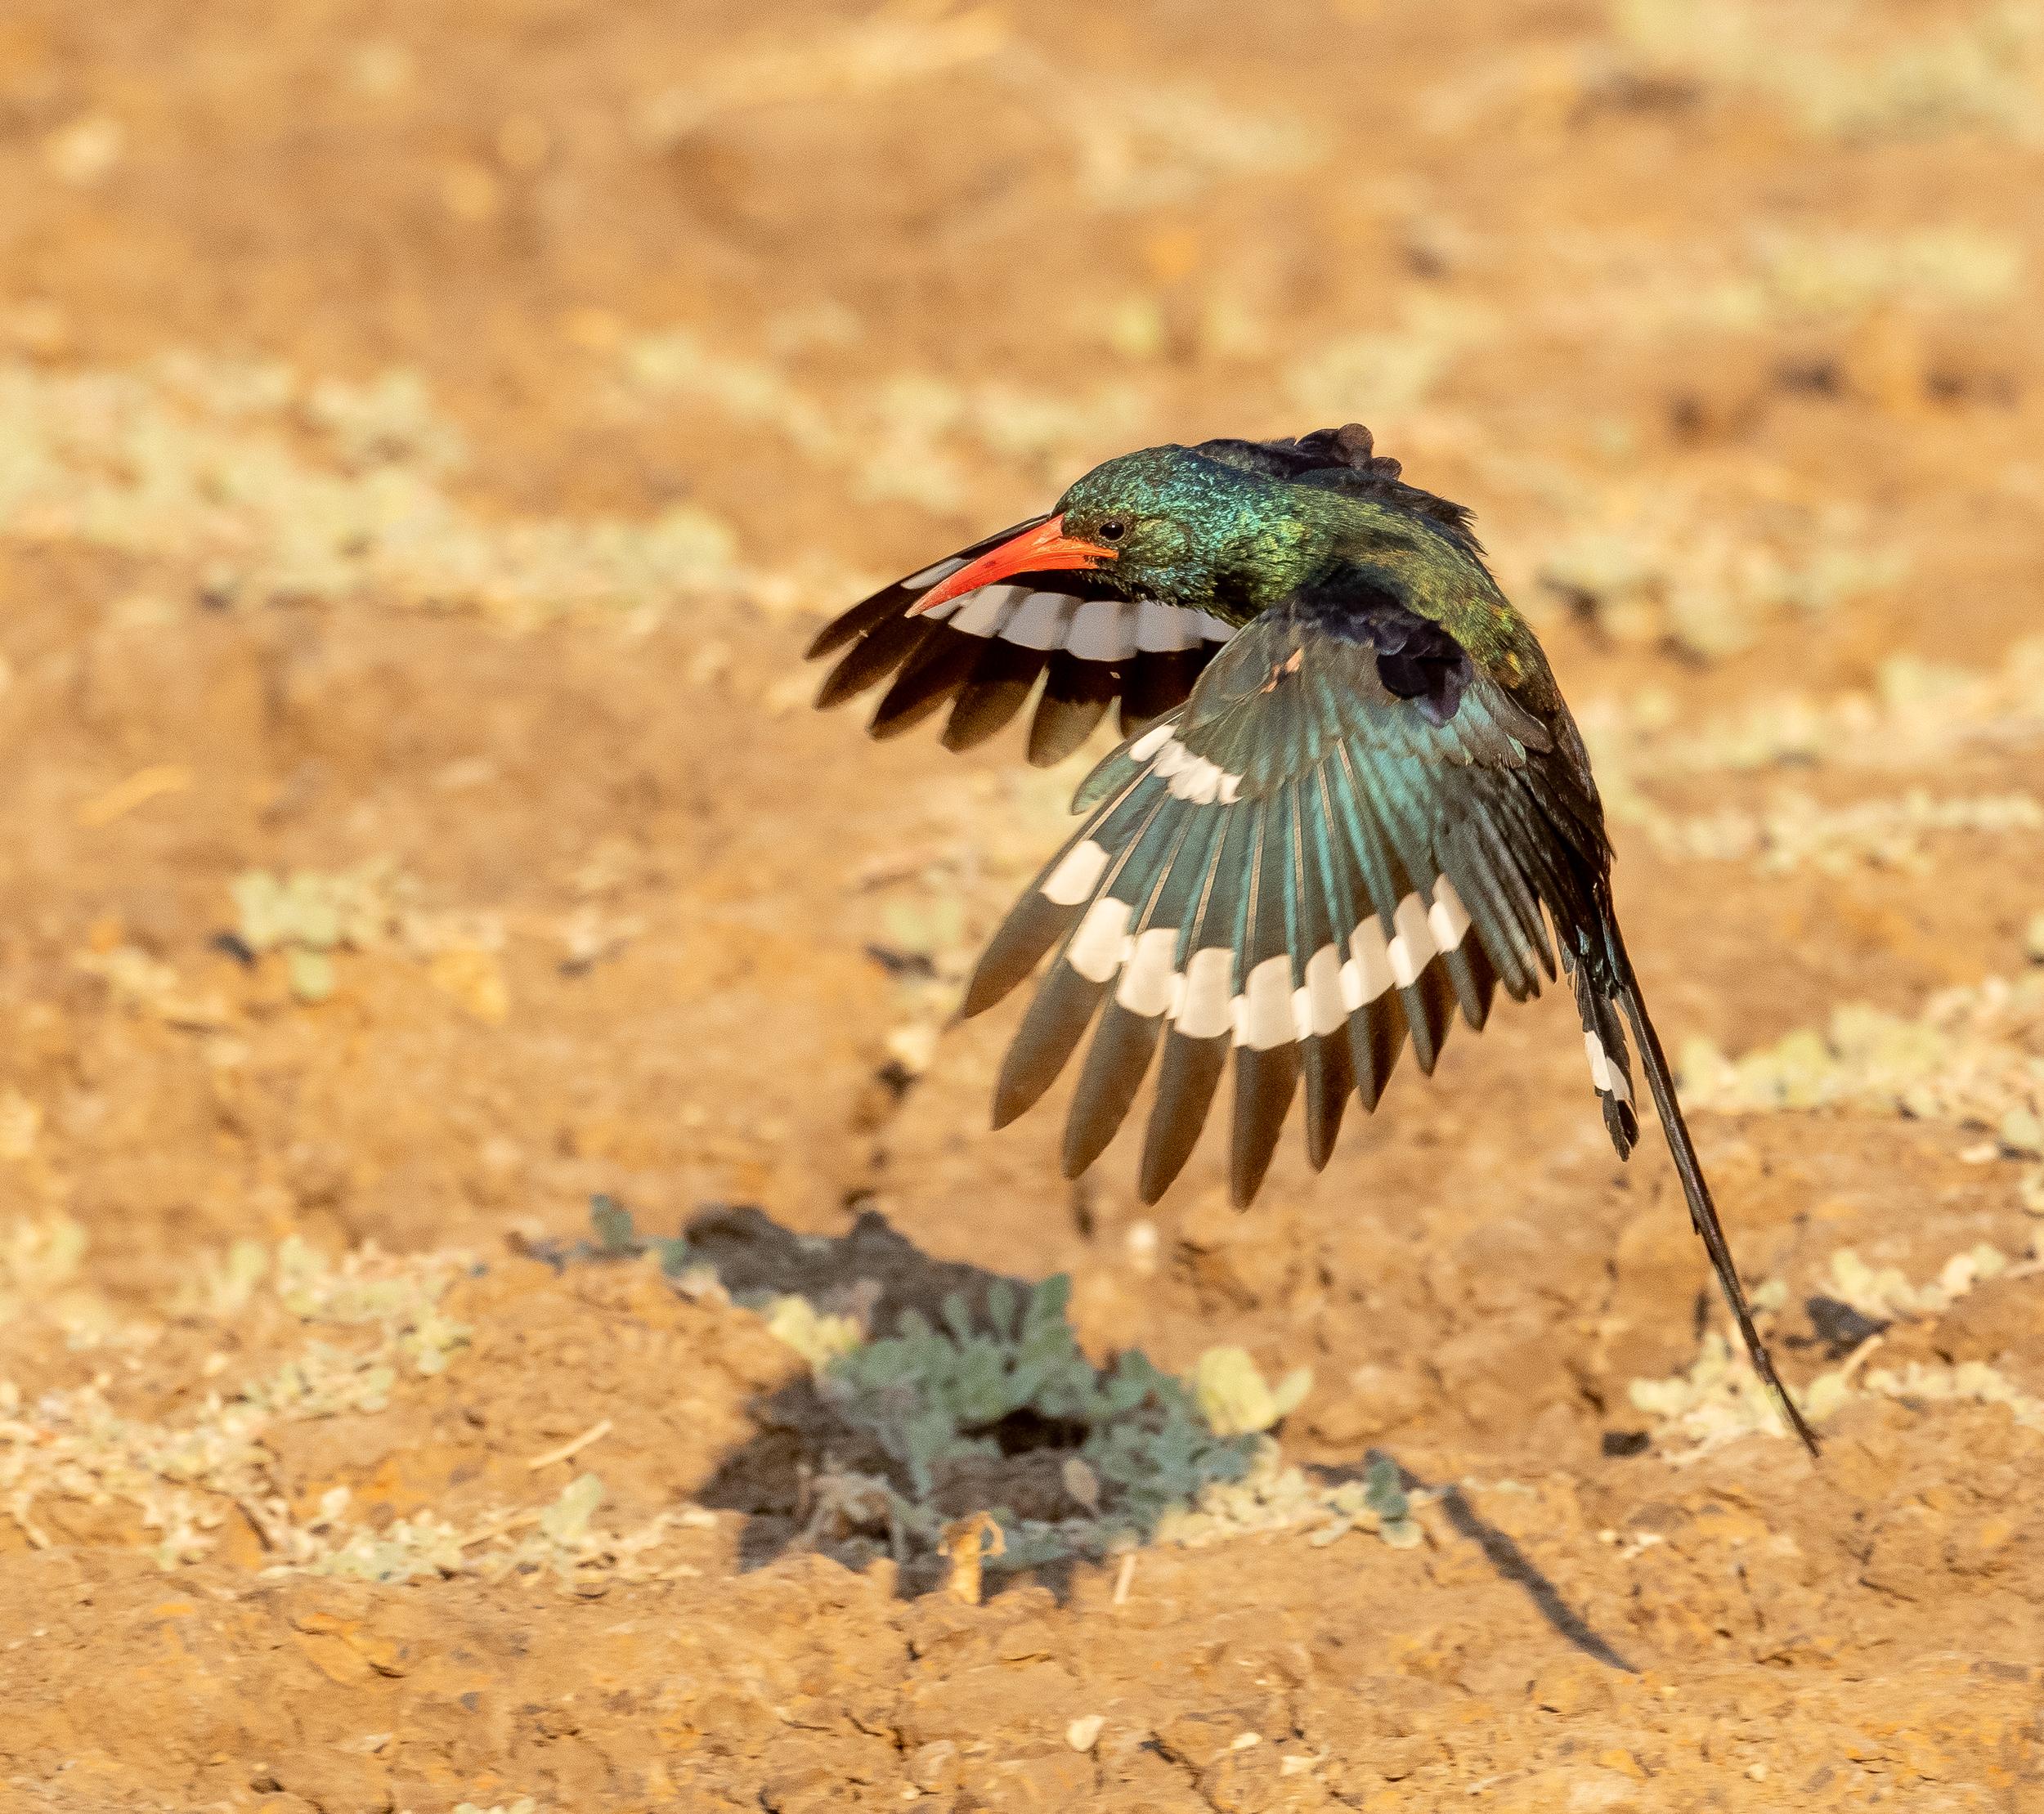 Zambia-4910.jpg